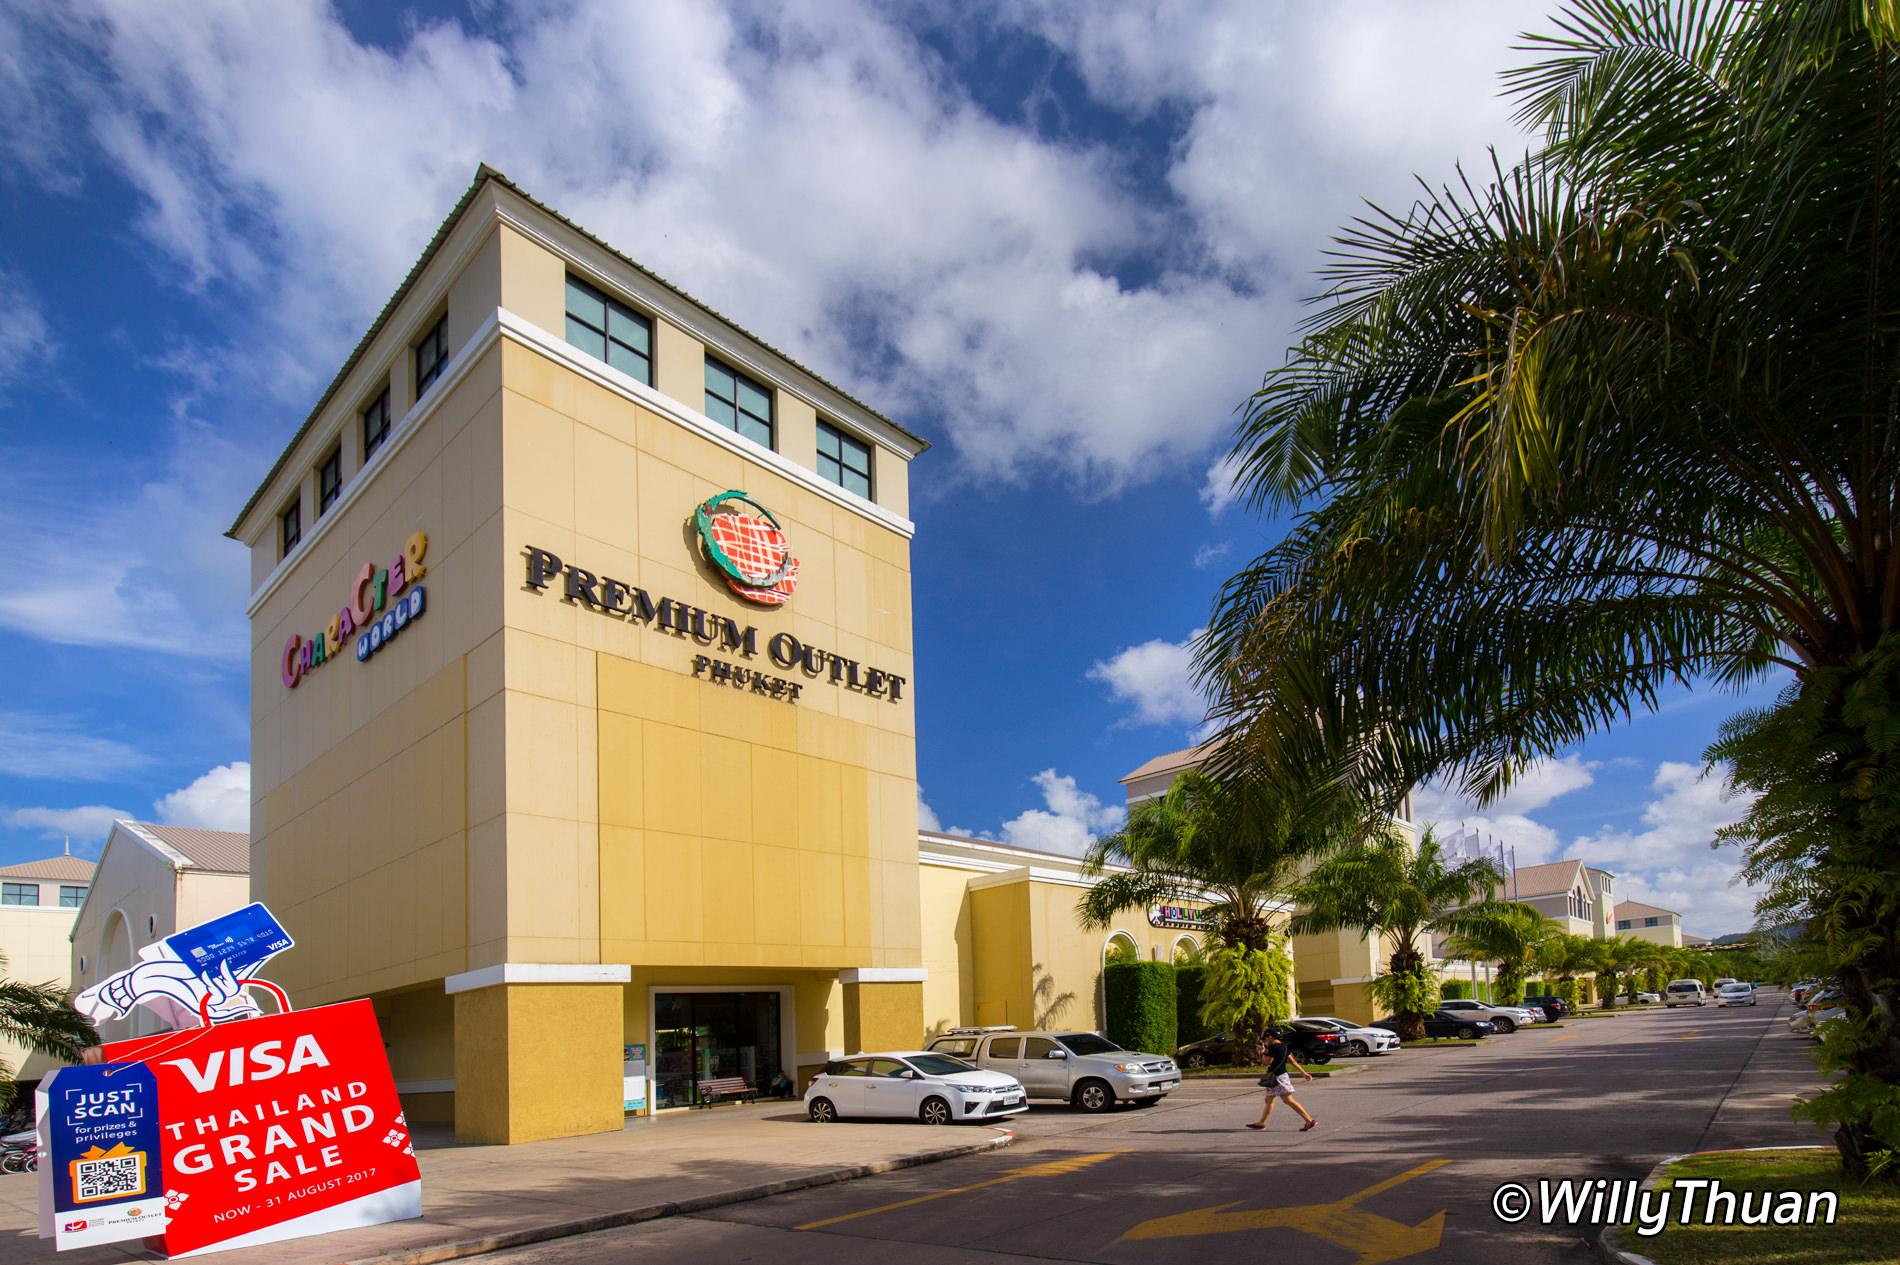 Premium Outlet Phuket